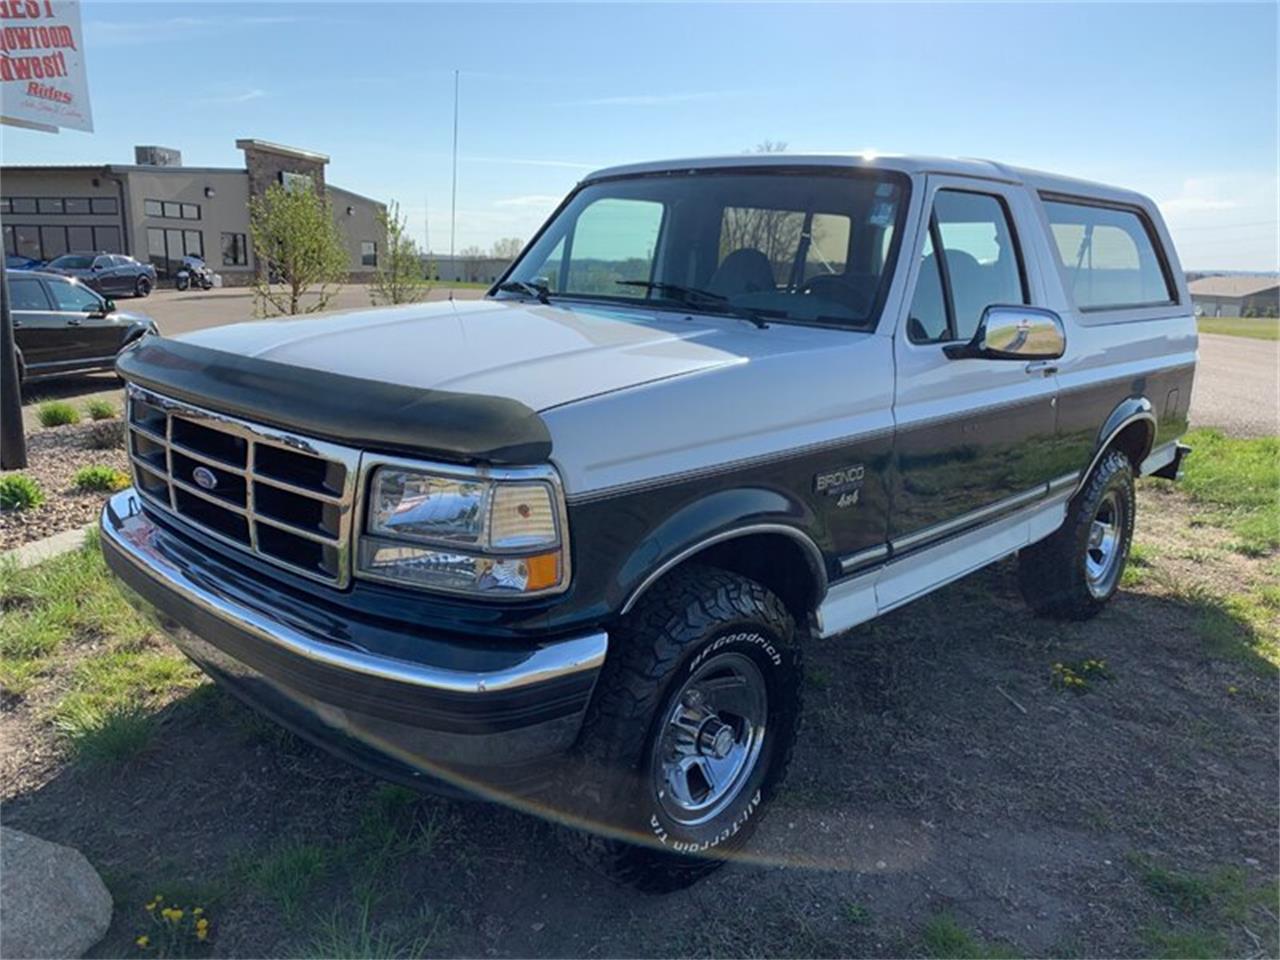 Large Picture of '94 Ford Bronco located in Bismarck North Dakota - Q4UY